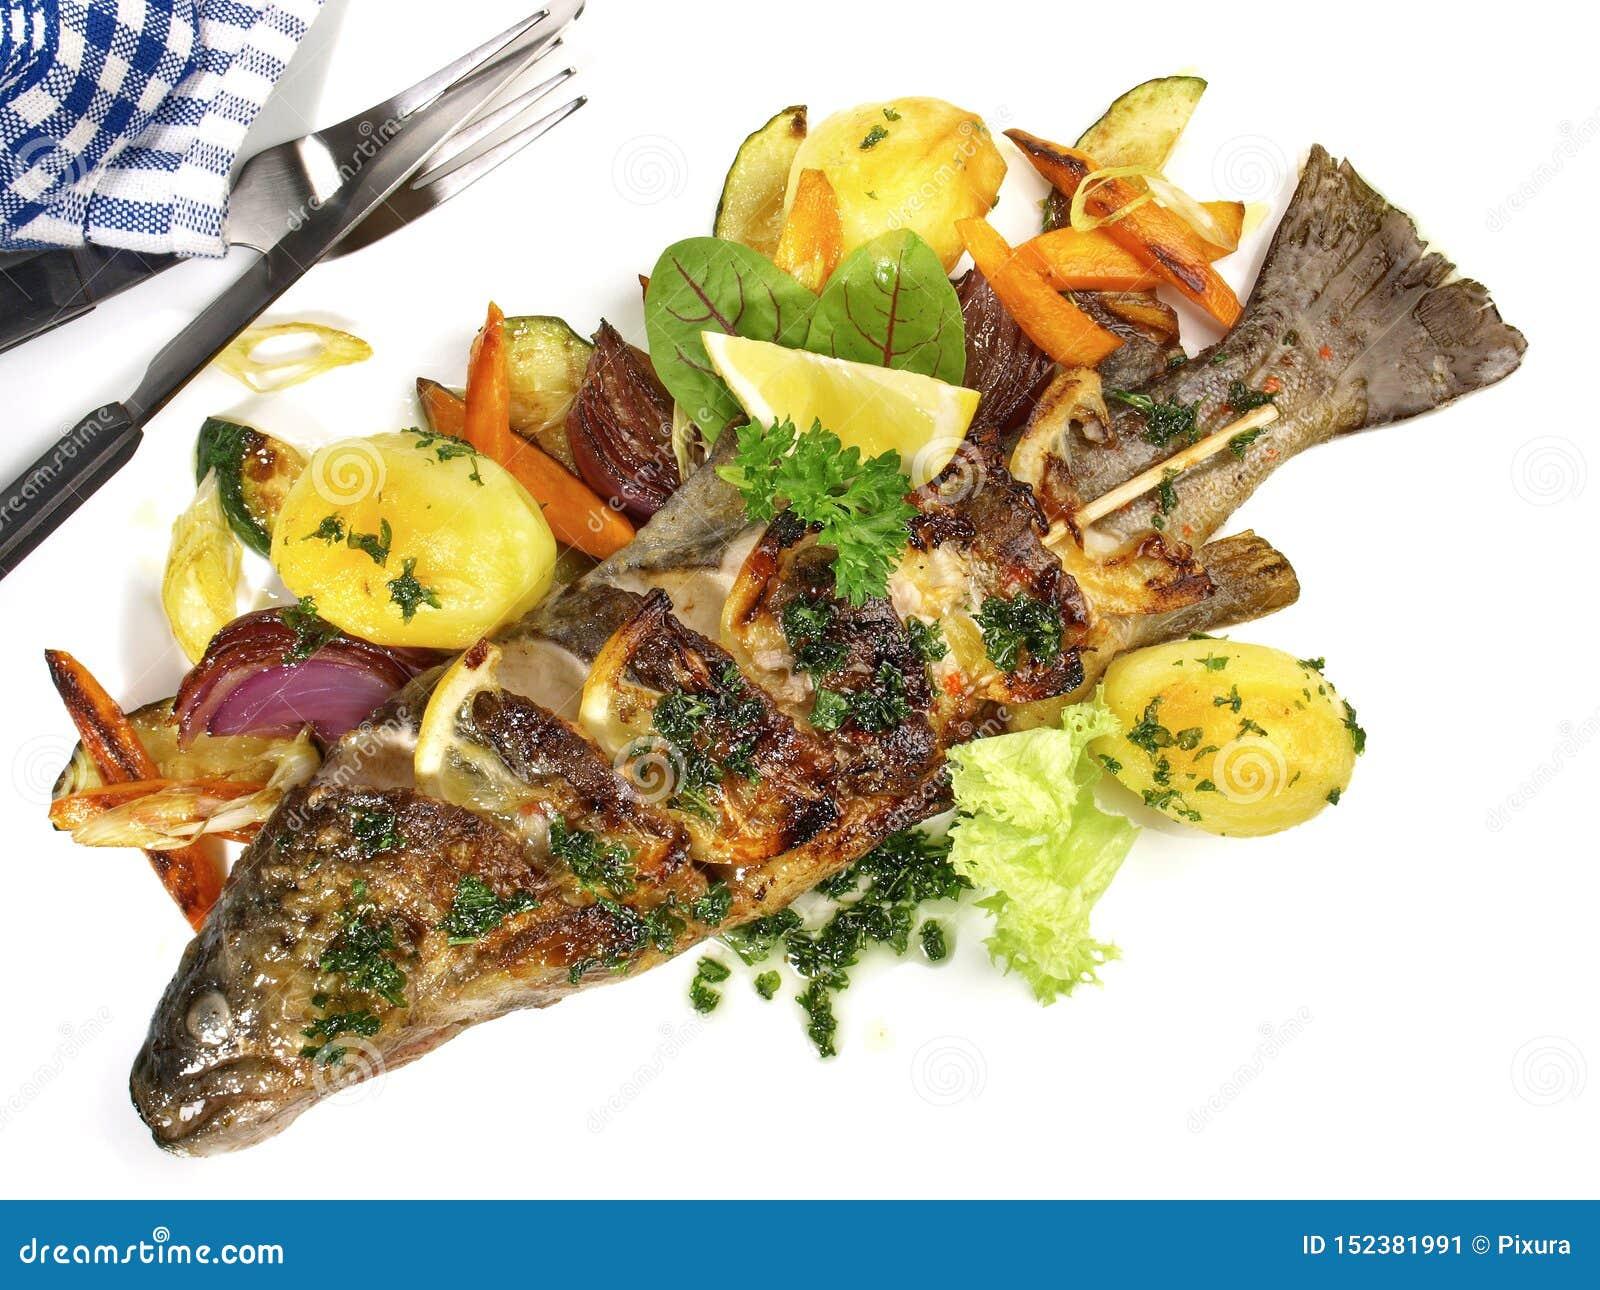 Pesce grigliato - trota iridea con le verdure e le patate